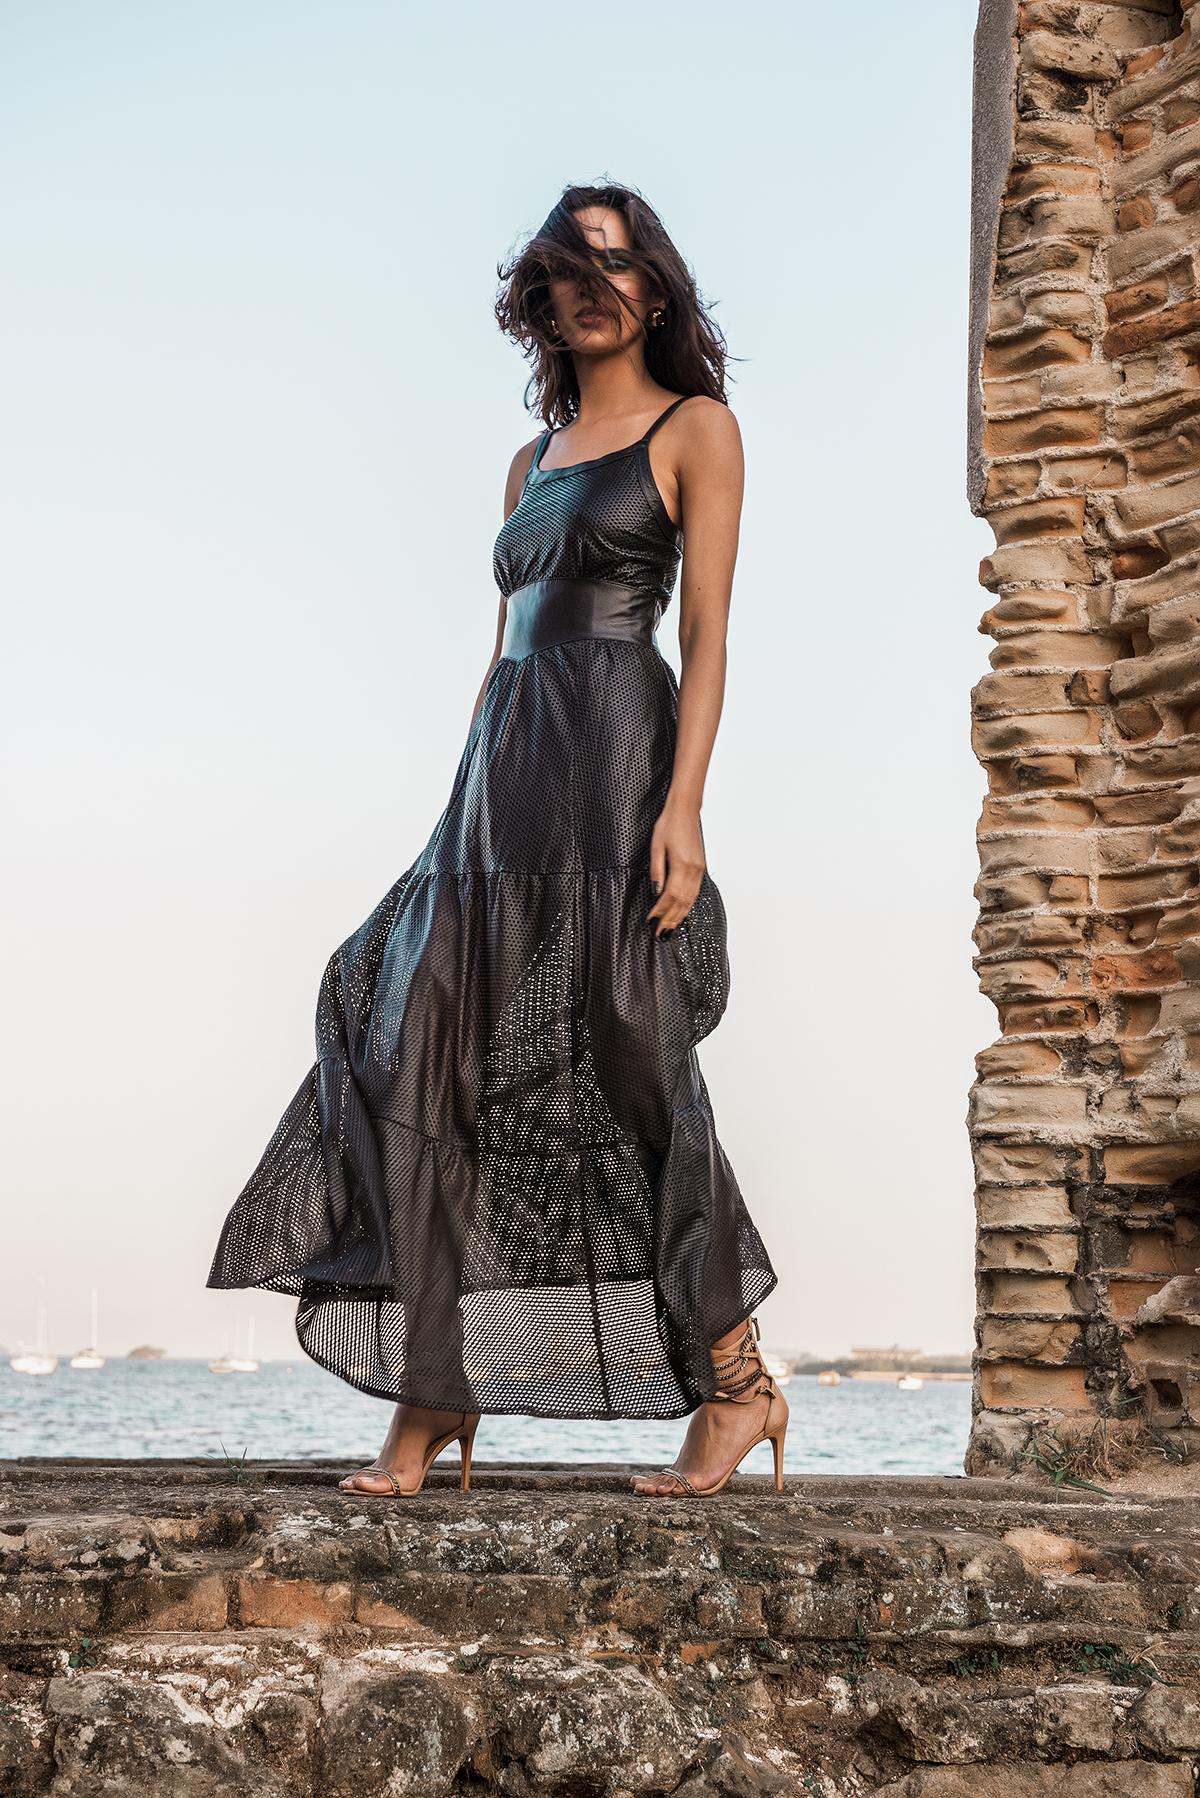 Vestido de couro preto